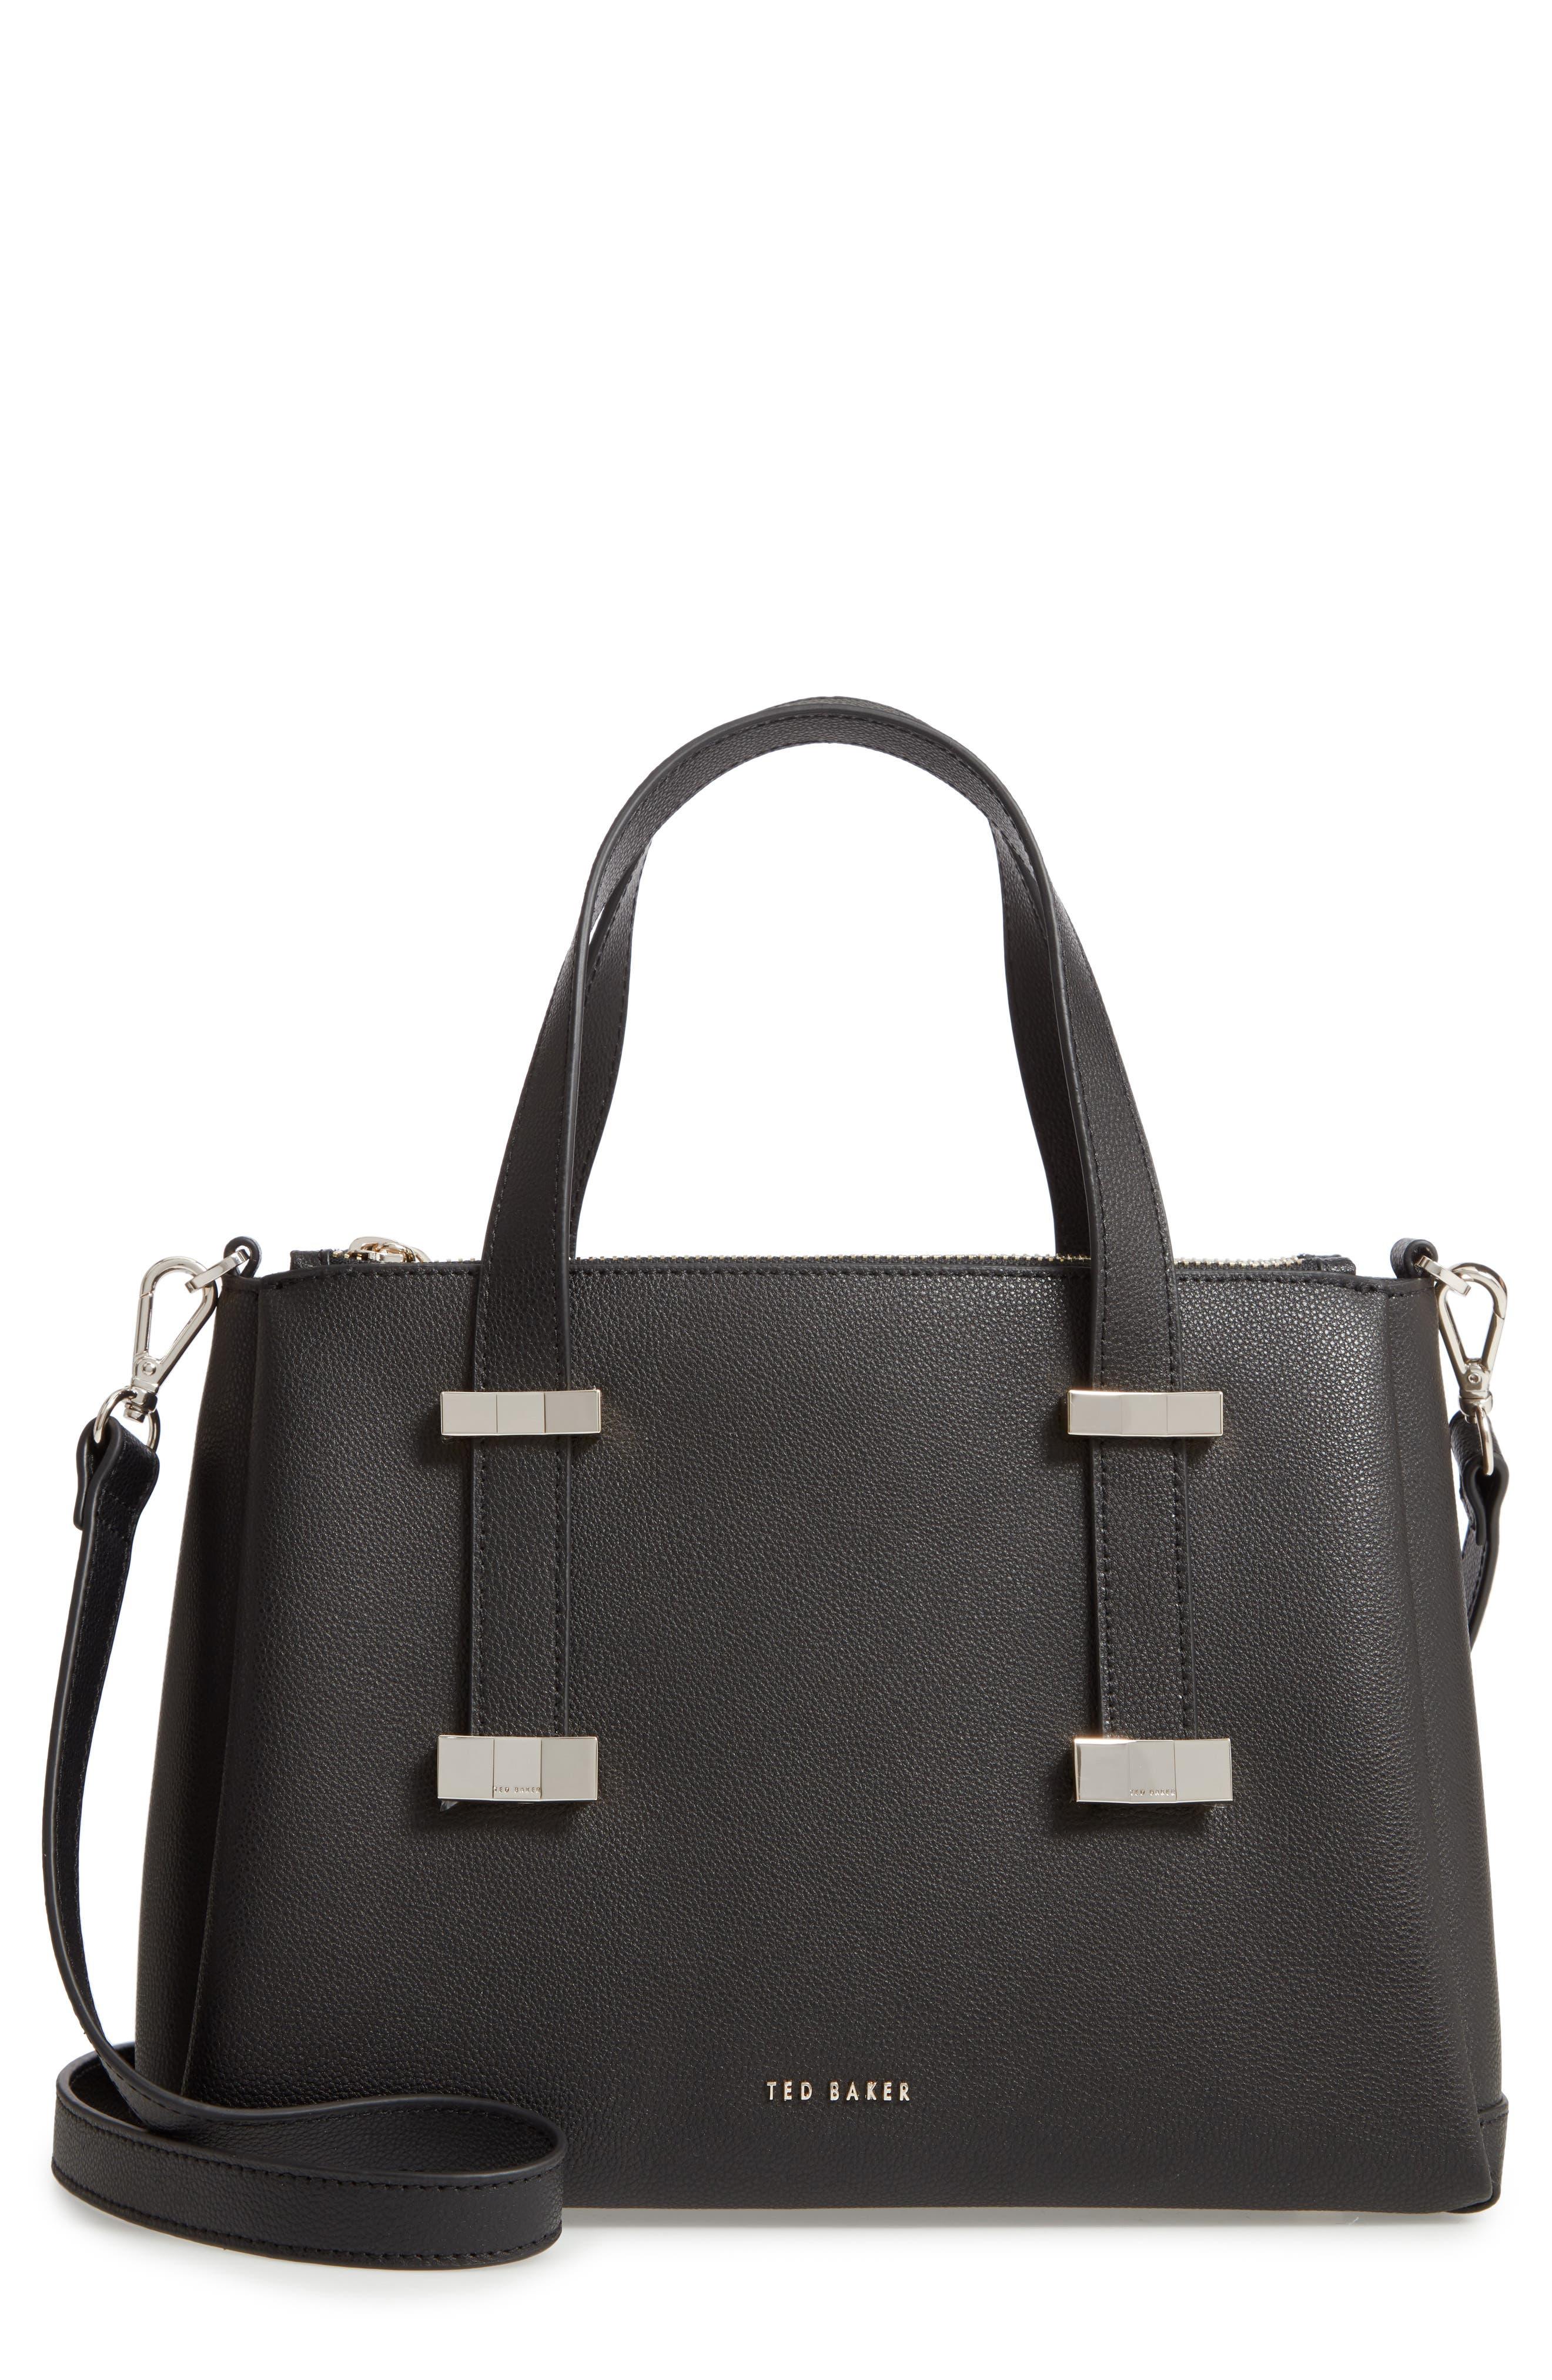 Julieet Large Adjustable Handle Leather Satchel,                             Main thumbnail 1, color,                             BLACK